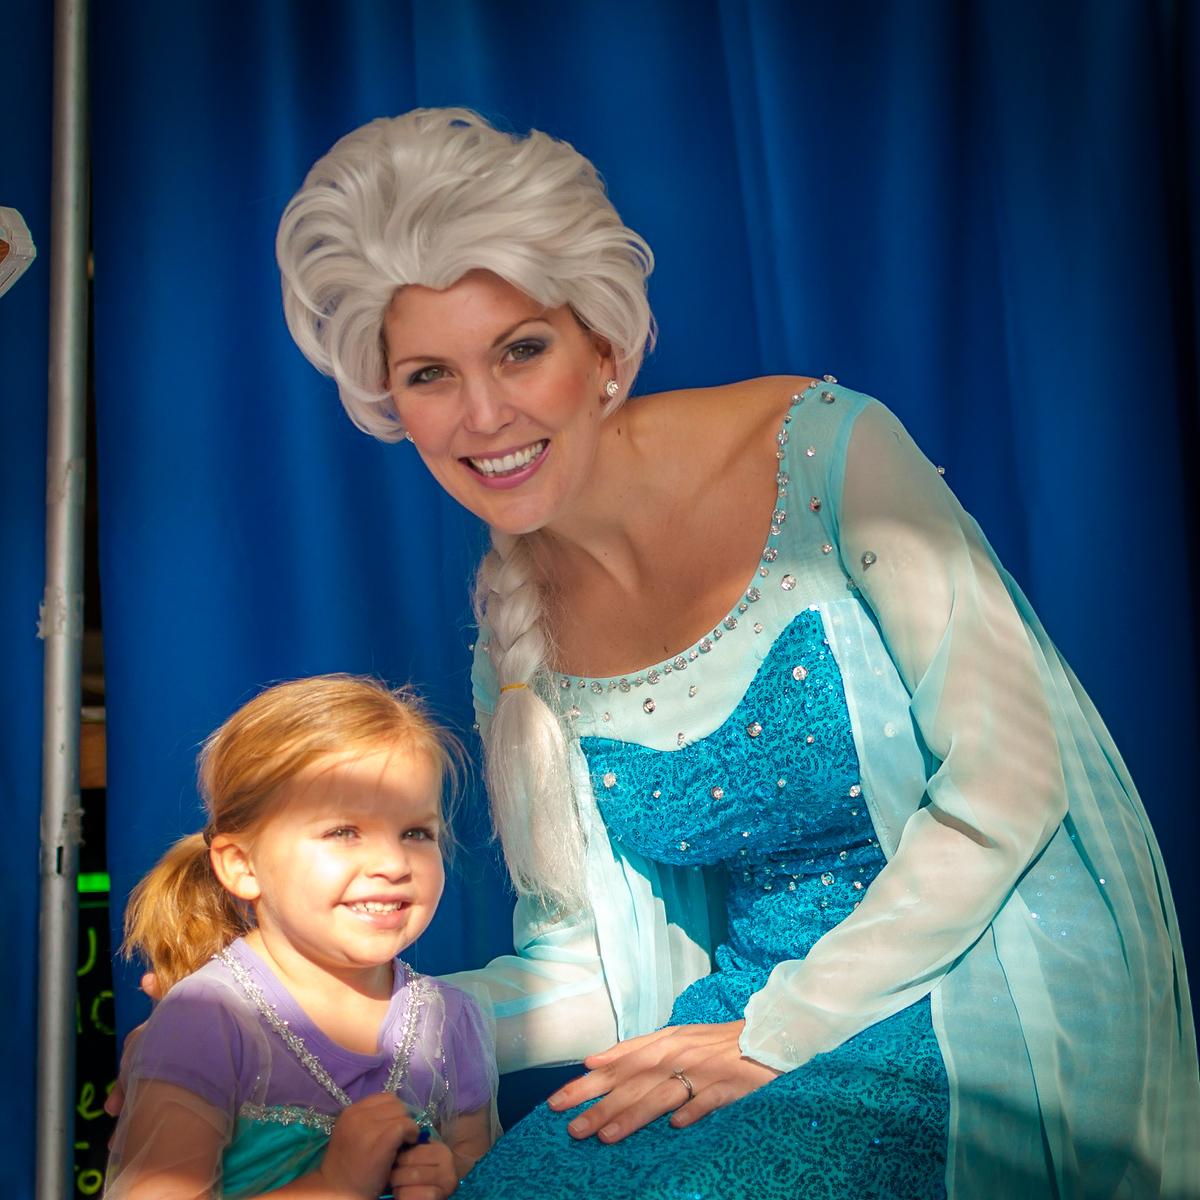 Meeting Elsa